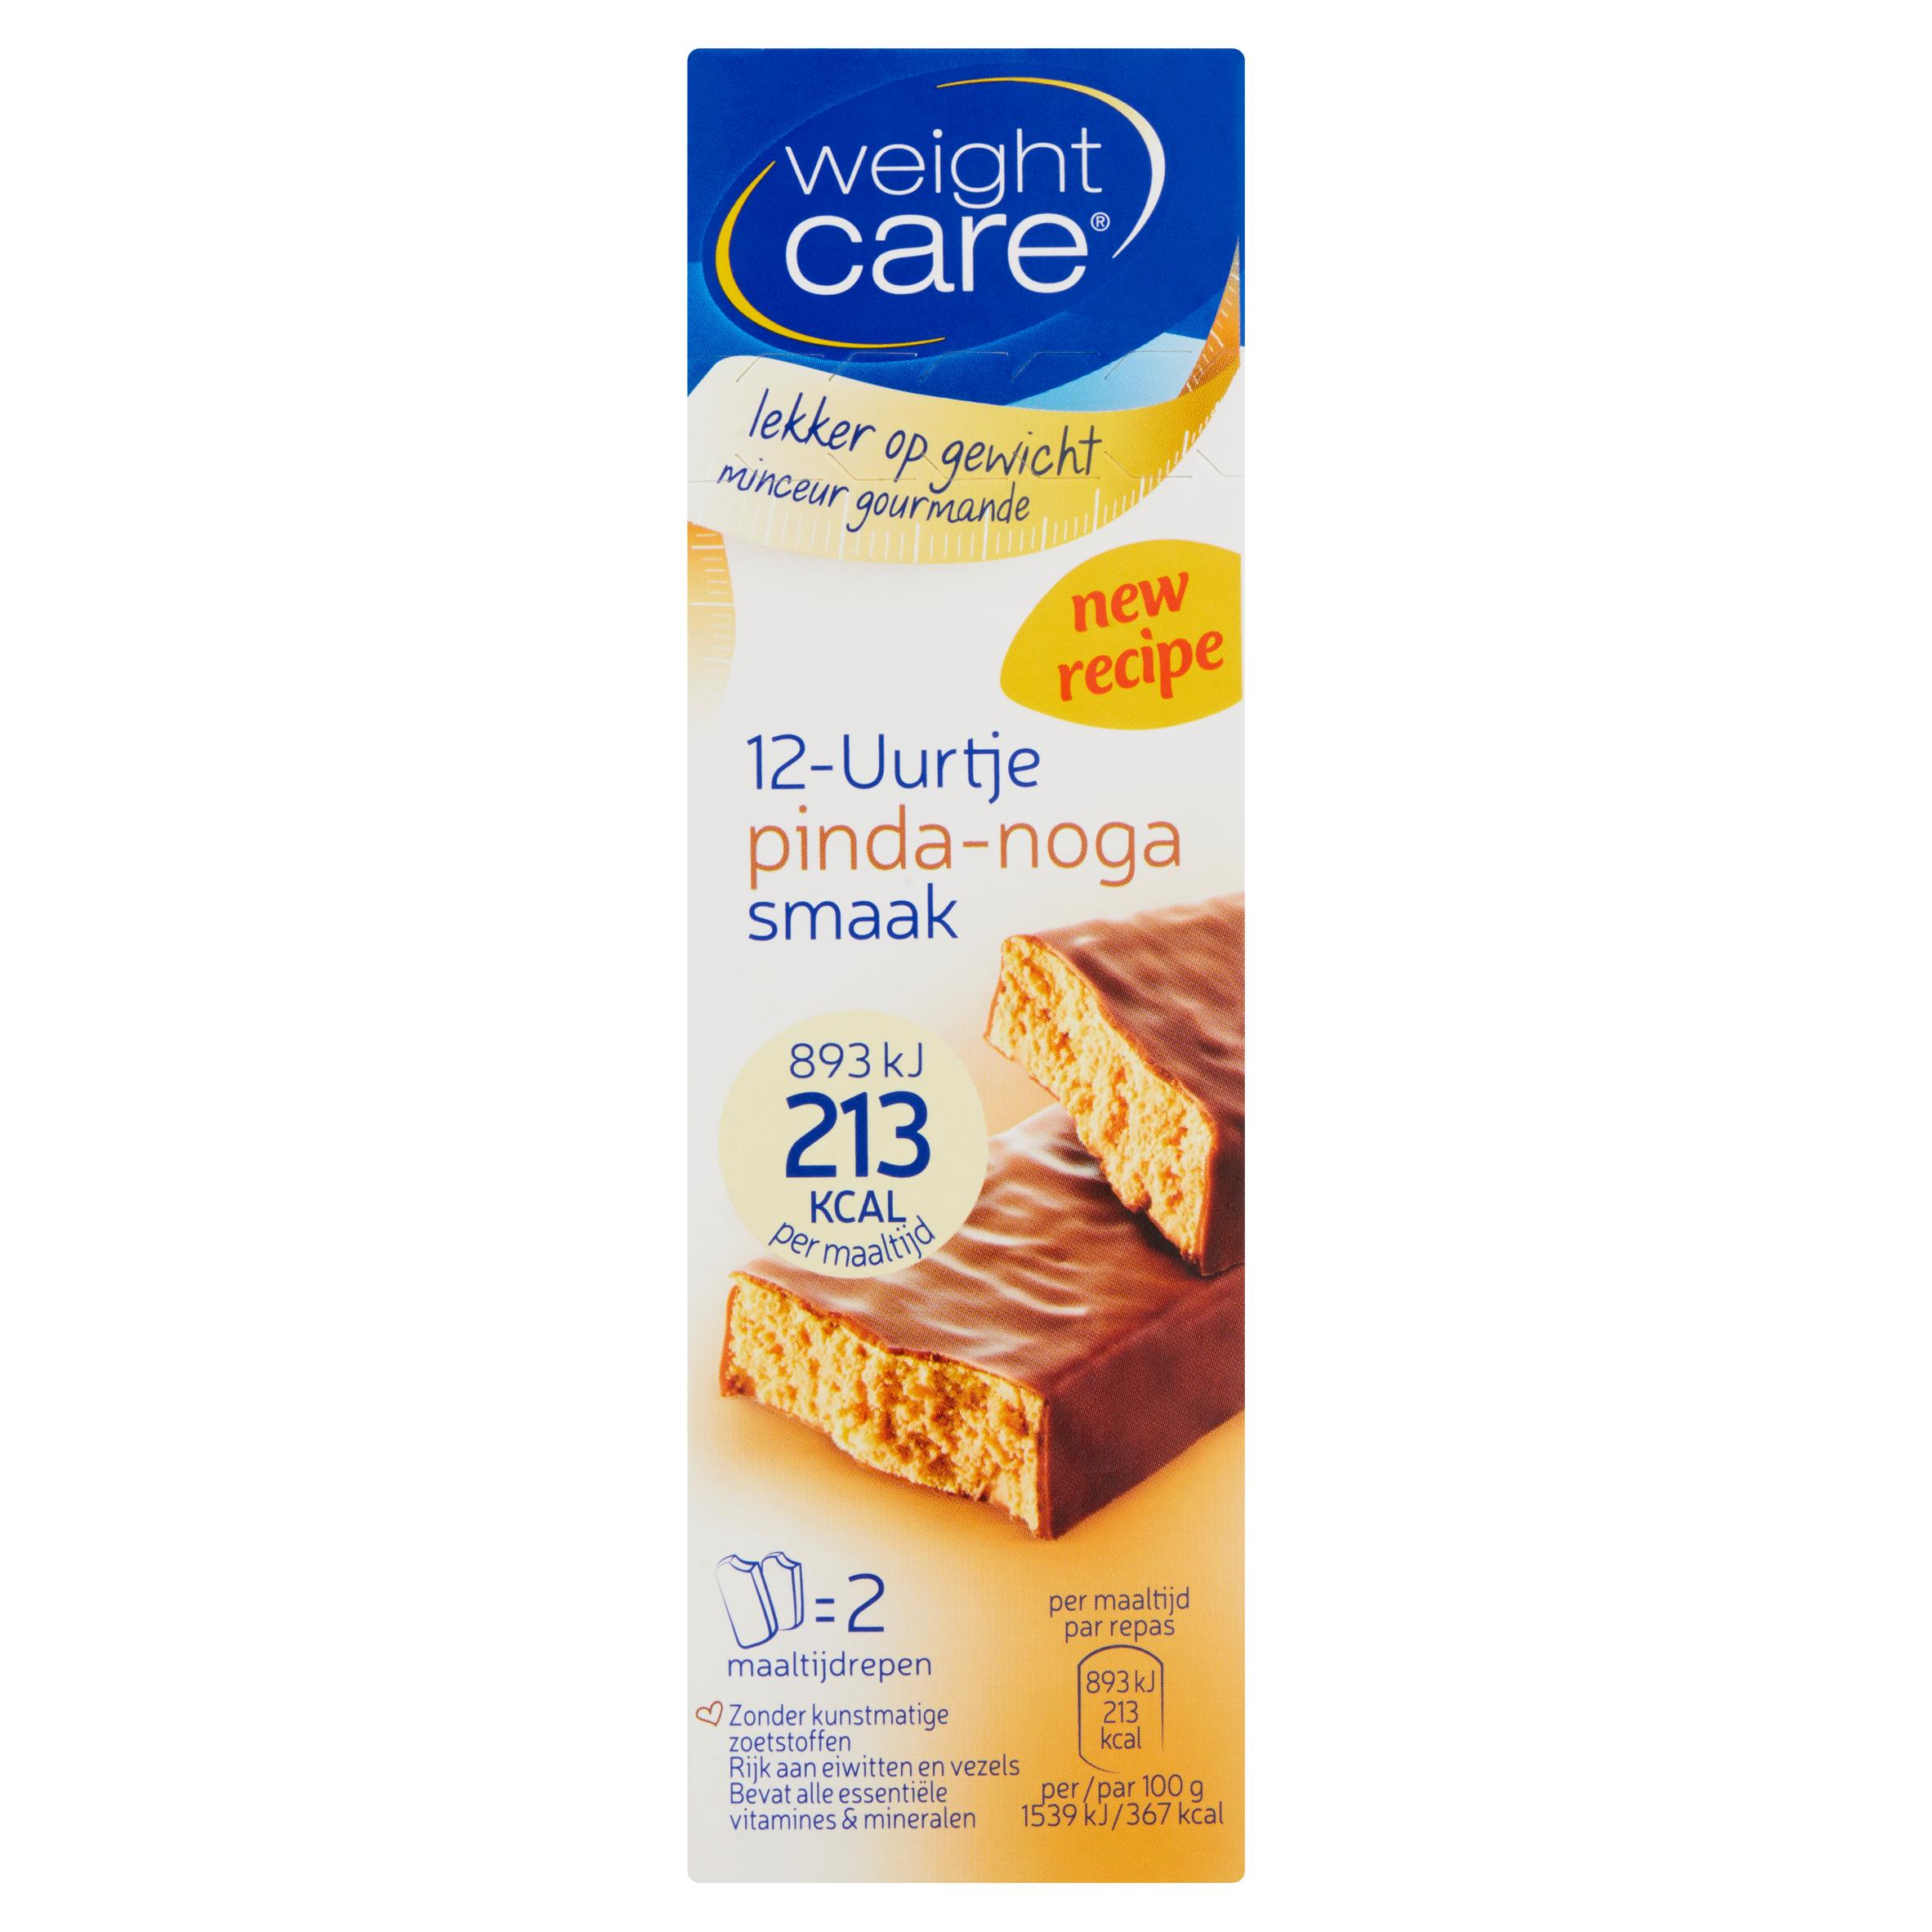 Weight Care 12-Uurtje Pinda-Noga Smaak 2 x 58 g